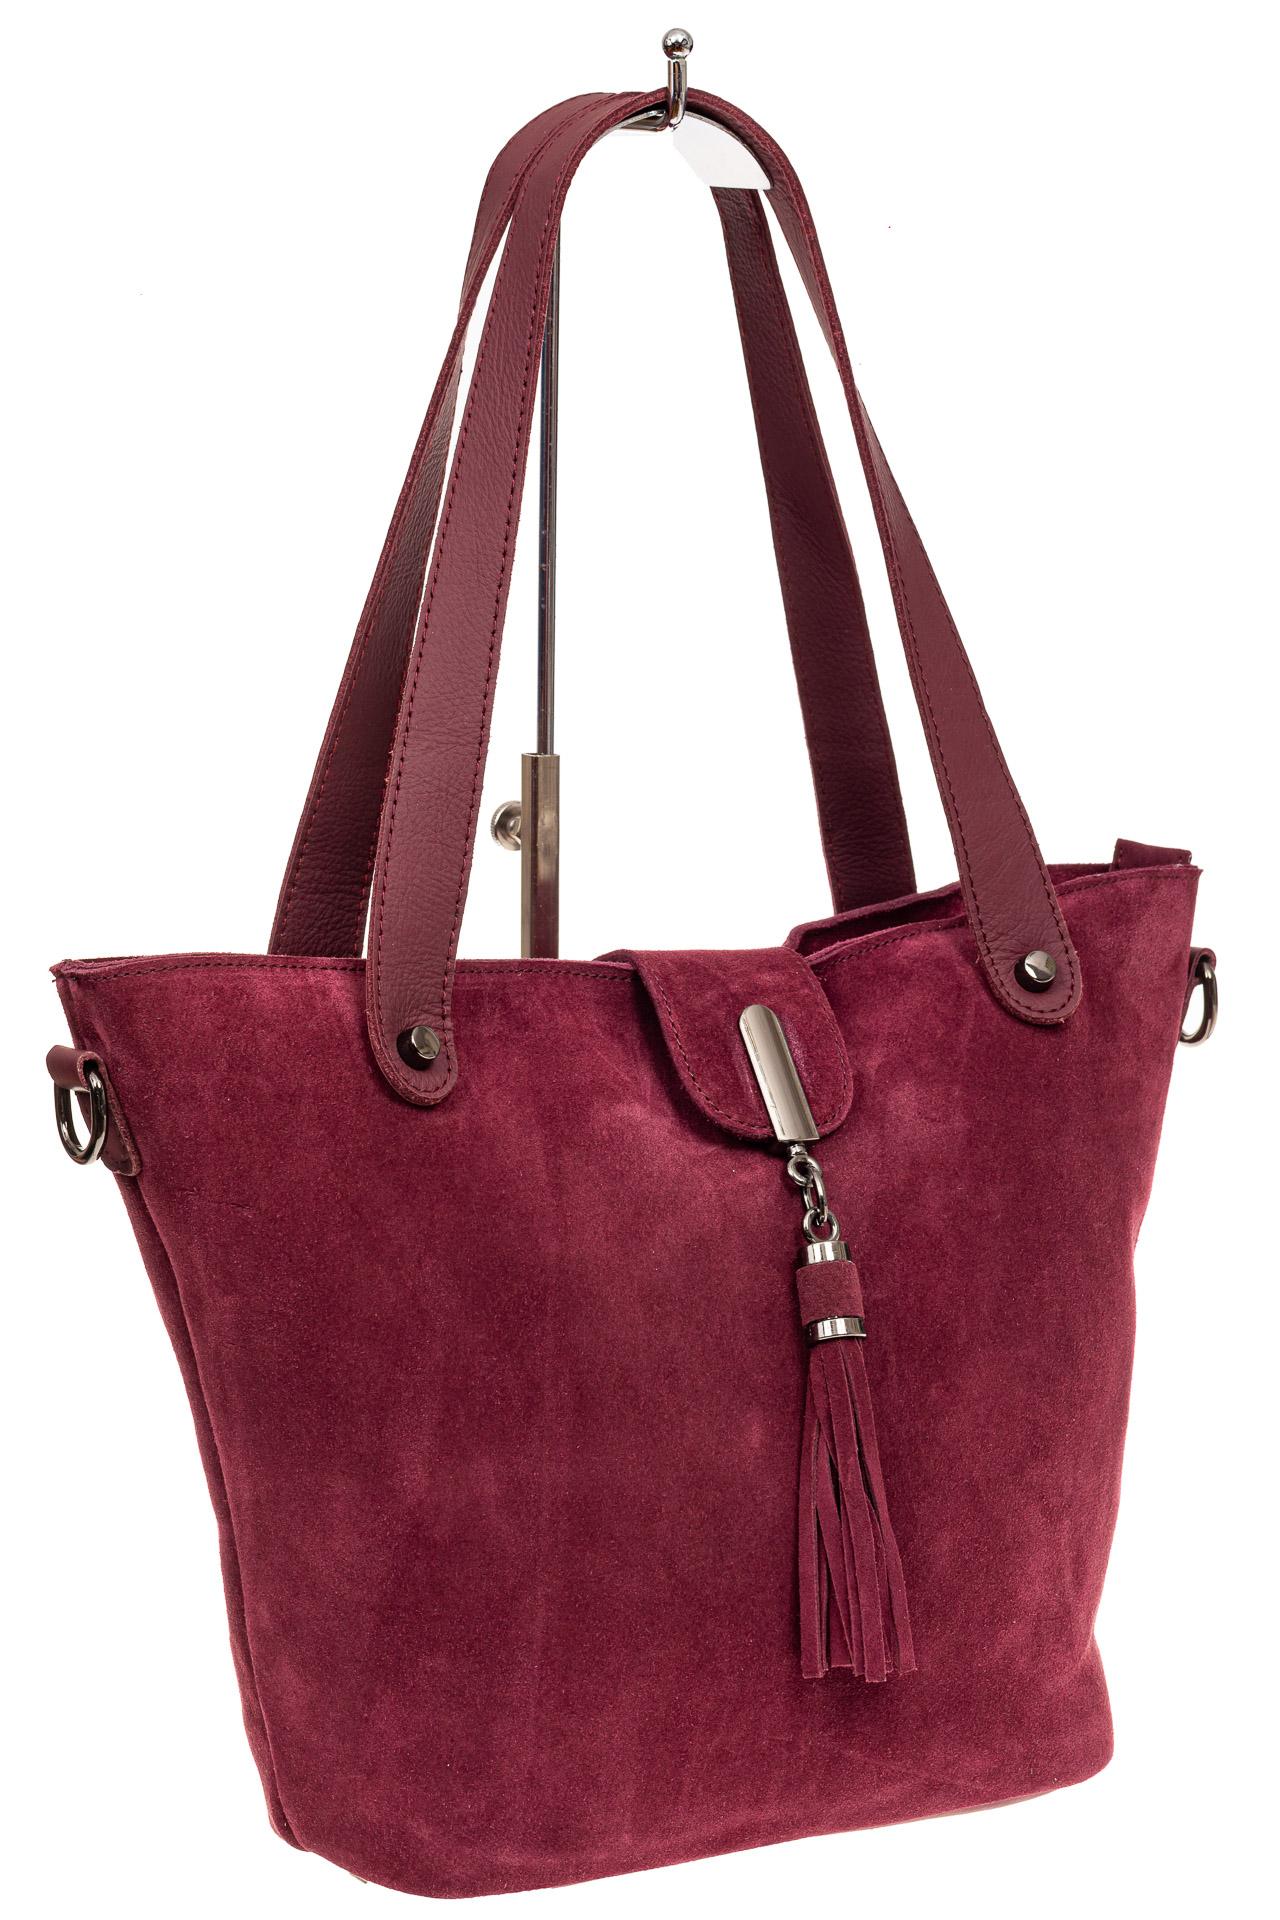 Замшевая сумка шоппер, цвет бордовыйA8006ZN8/4